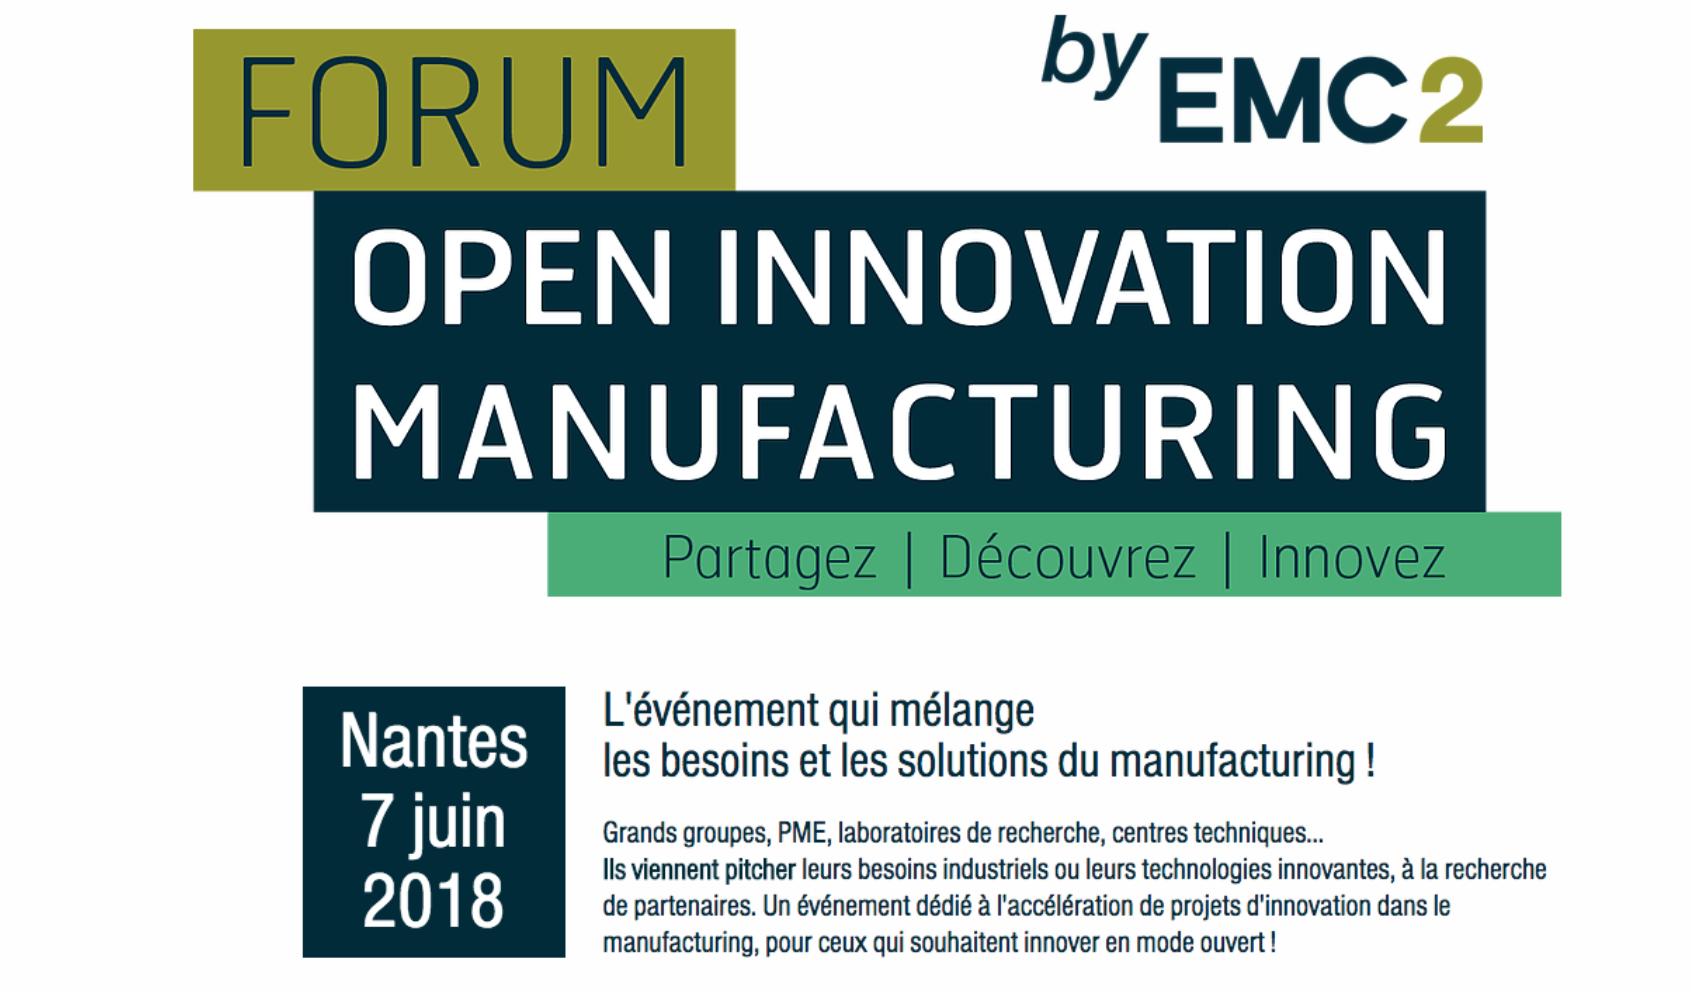 Forum open innnovation manufacturing